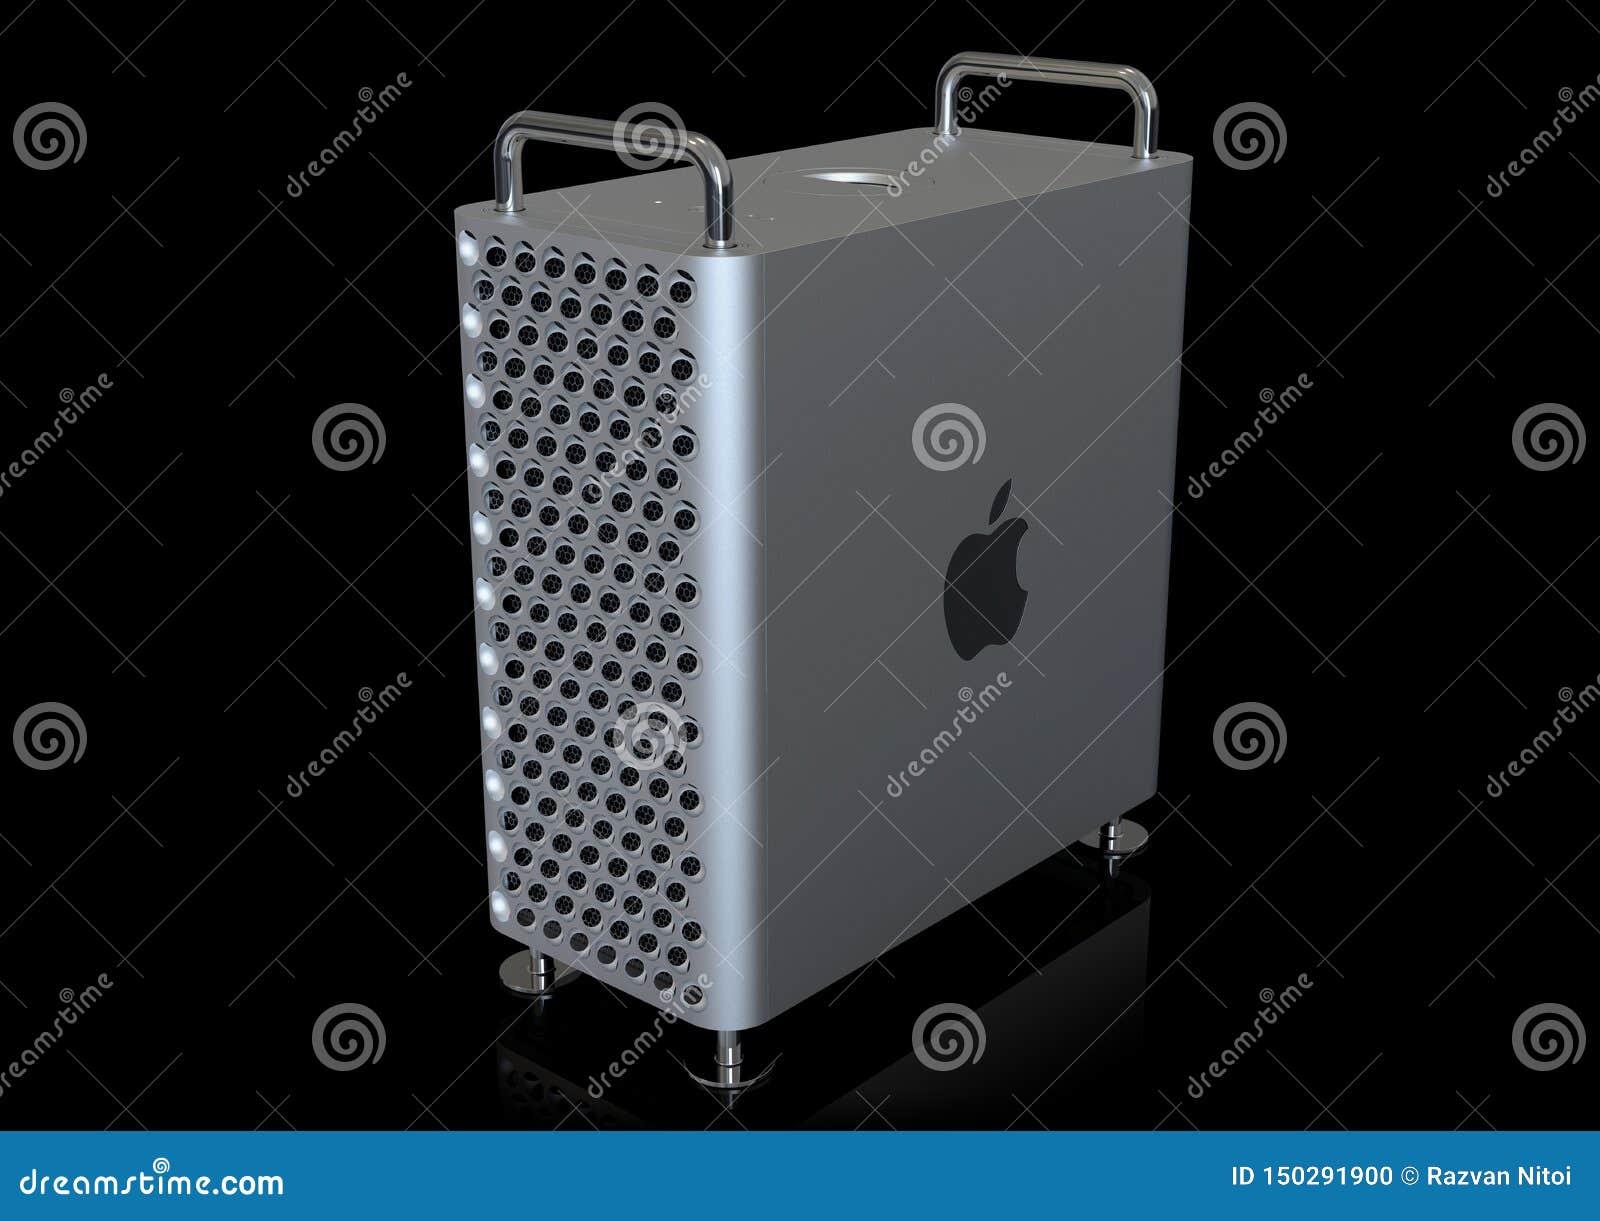 Apple Mac Pro 2019 Desktop Computer, Perspective On Black